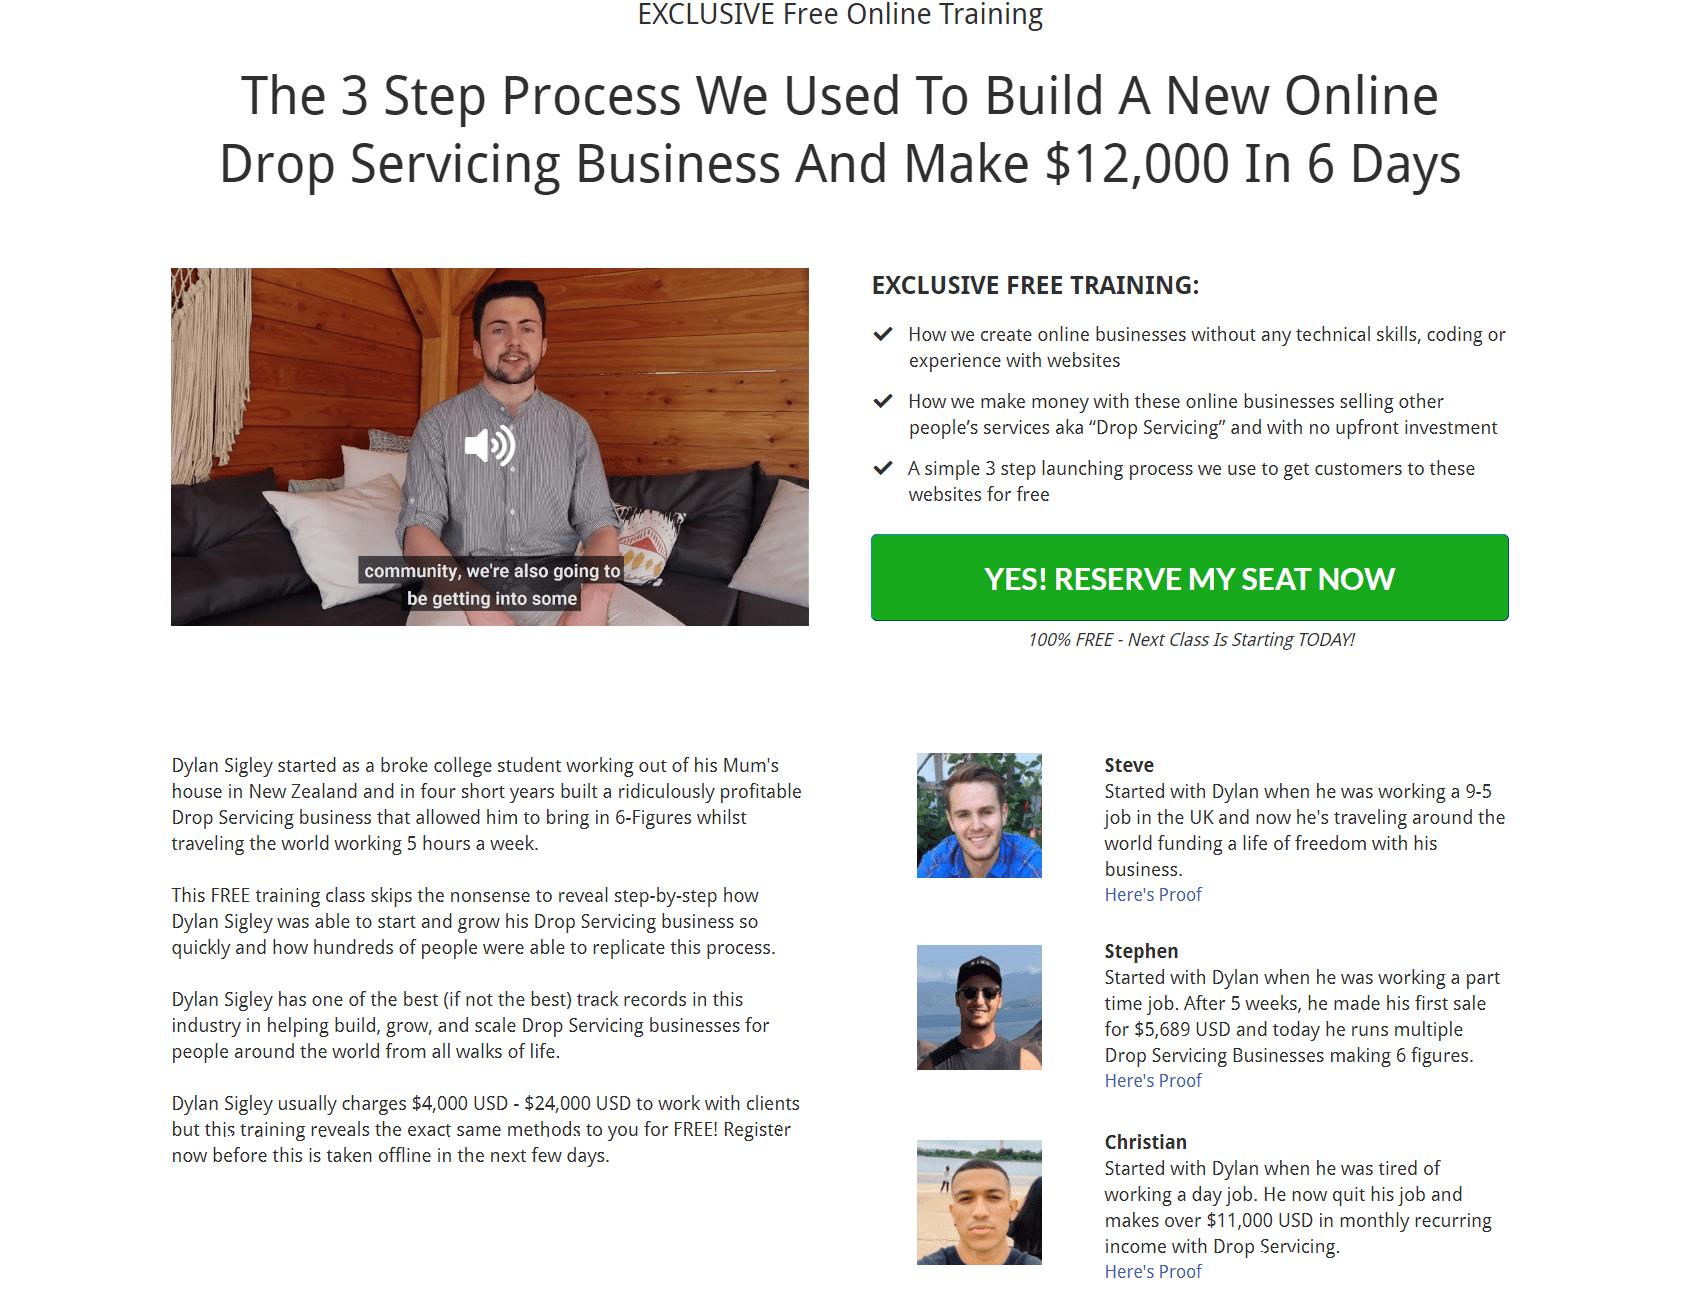 Drop Servicing Blueprint Overview